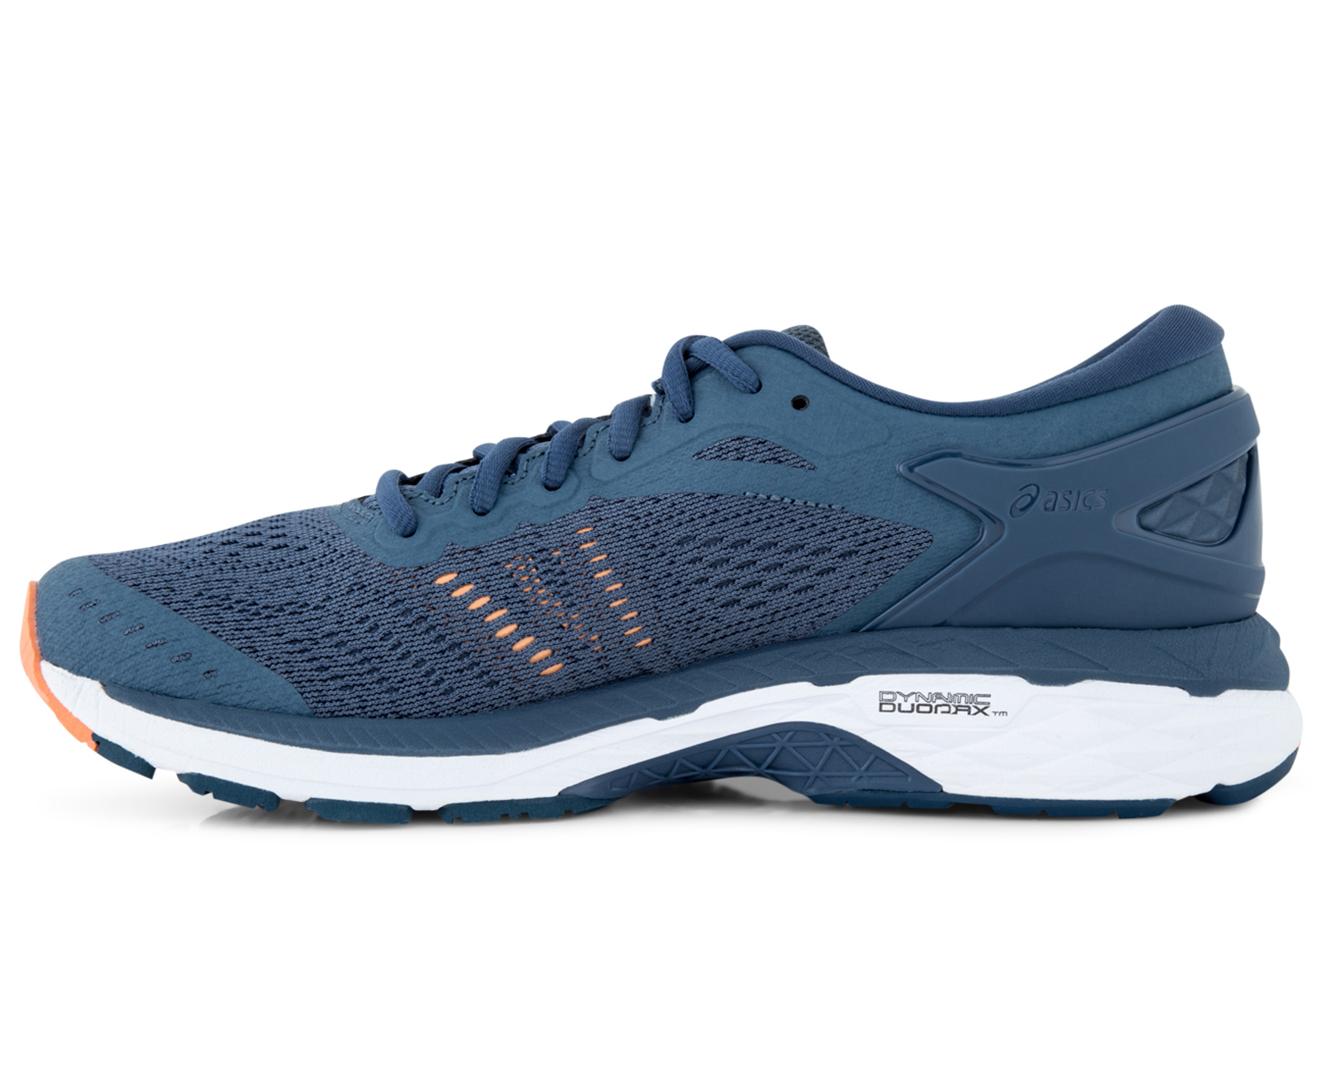 Asics Women S Gel Kayano 24 Shoe Smoke Blue Dark Blue